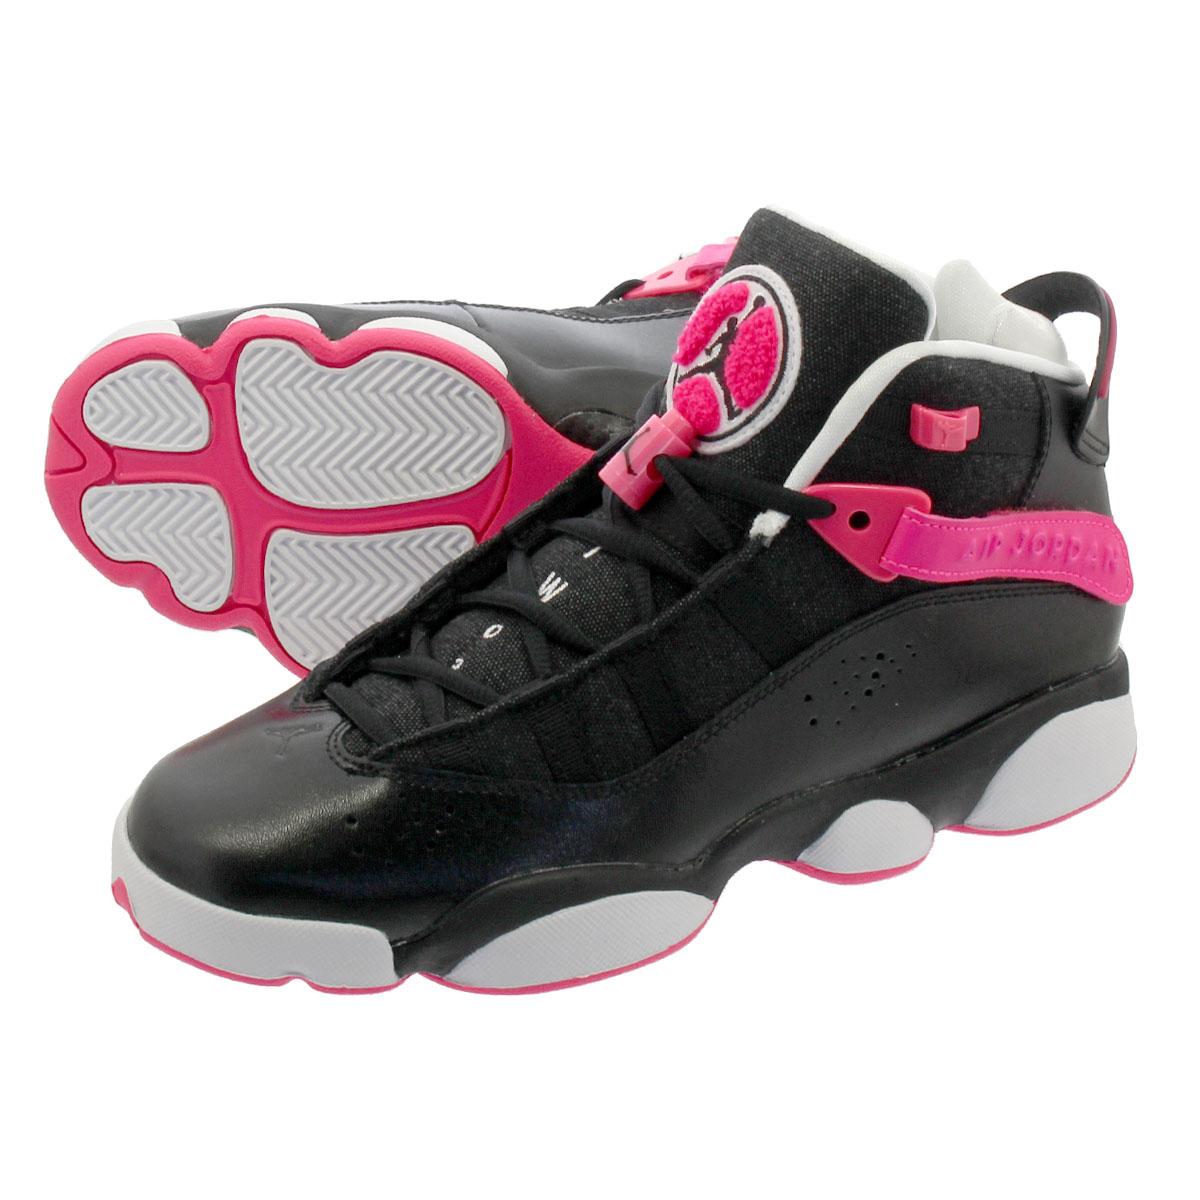 best service fc9ce 4a0c0 NIKE AIR JORDAN 6 RINGS GS Nike Jordan 6 RINGS Co.,Ltd. GS BLACK/HYPER  PINK/WHITE 323,399-061